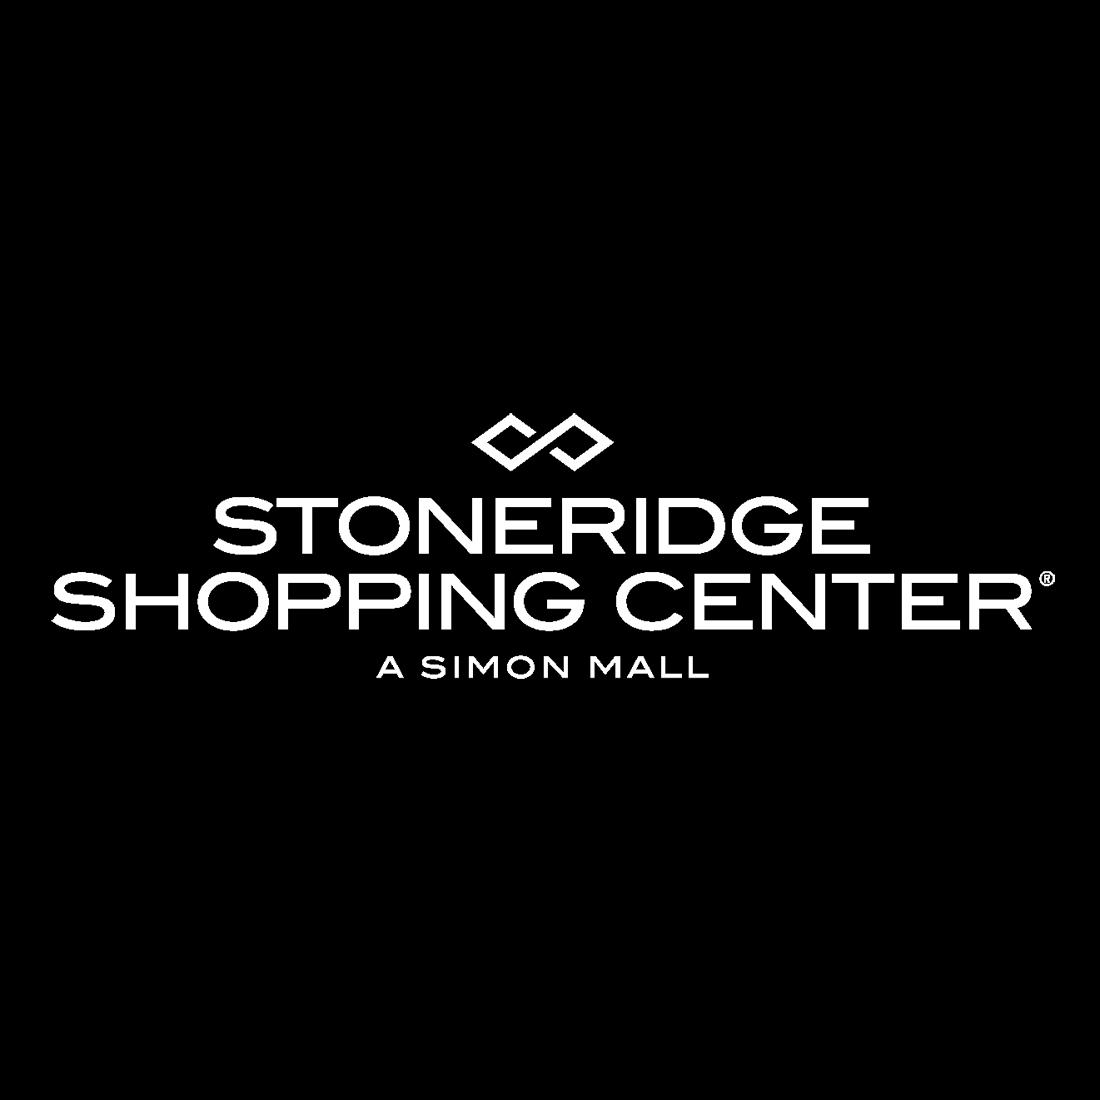 Stoneridge Shopping Center